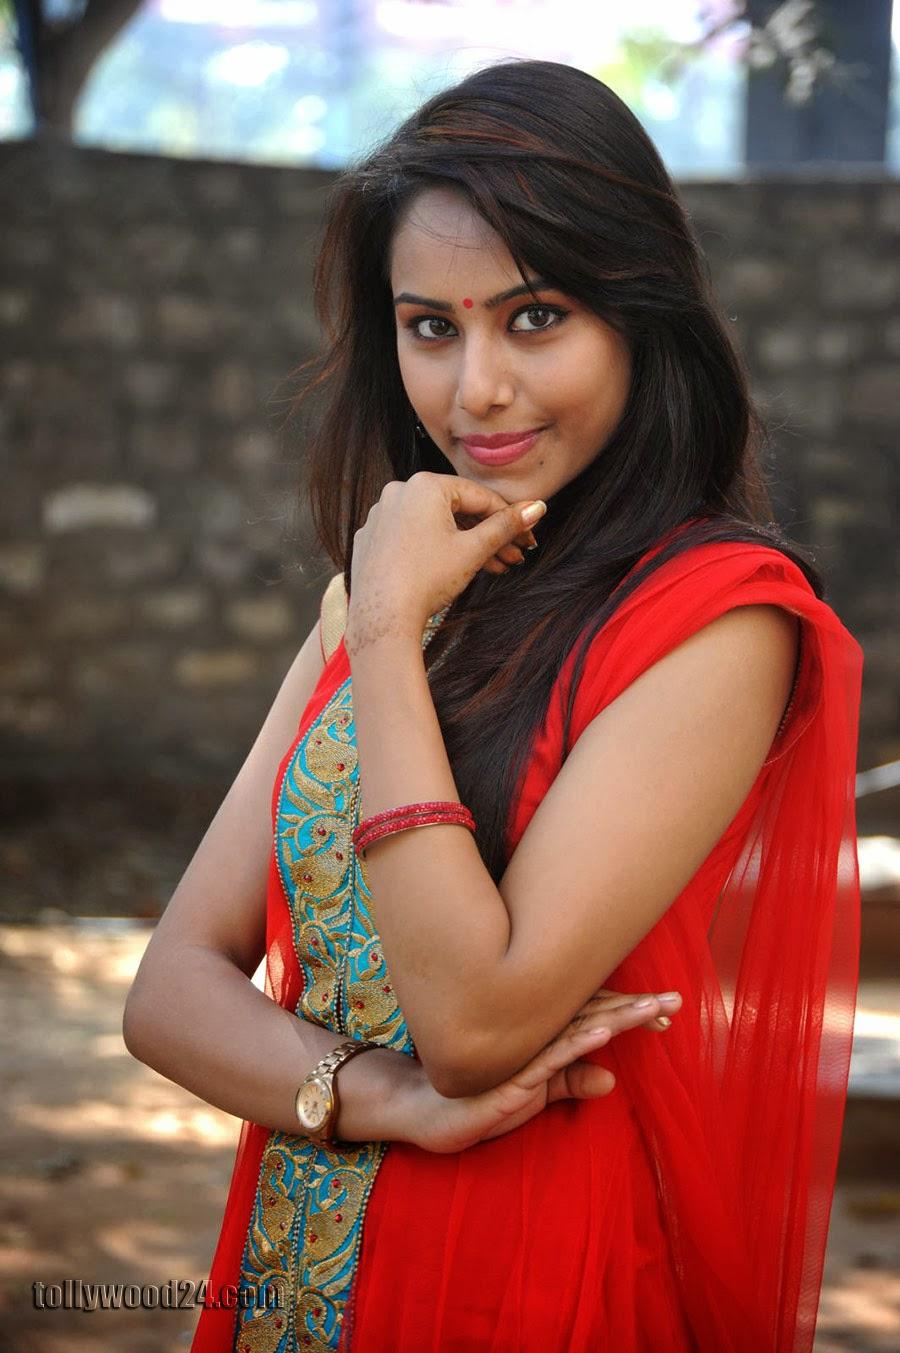 Beautiful Khenisha Chandran Photos Gallery-HQ-Photo-4